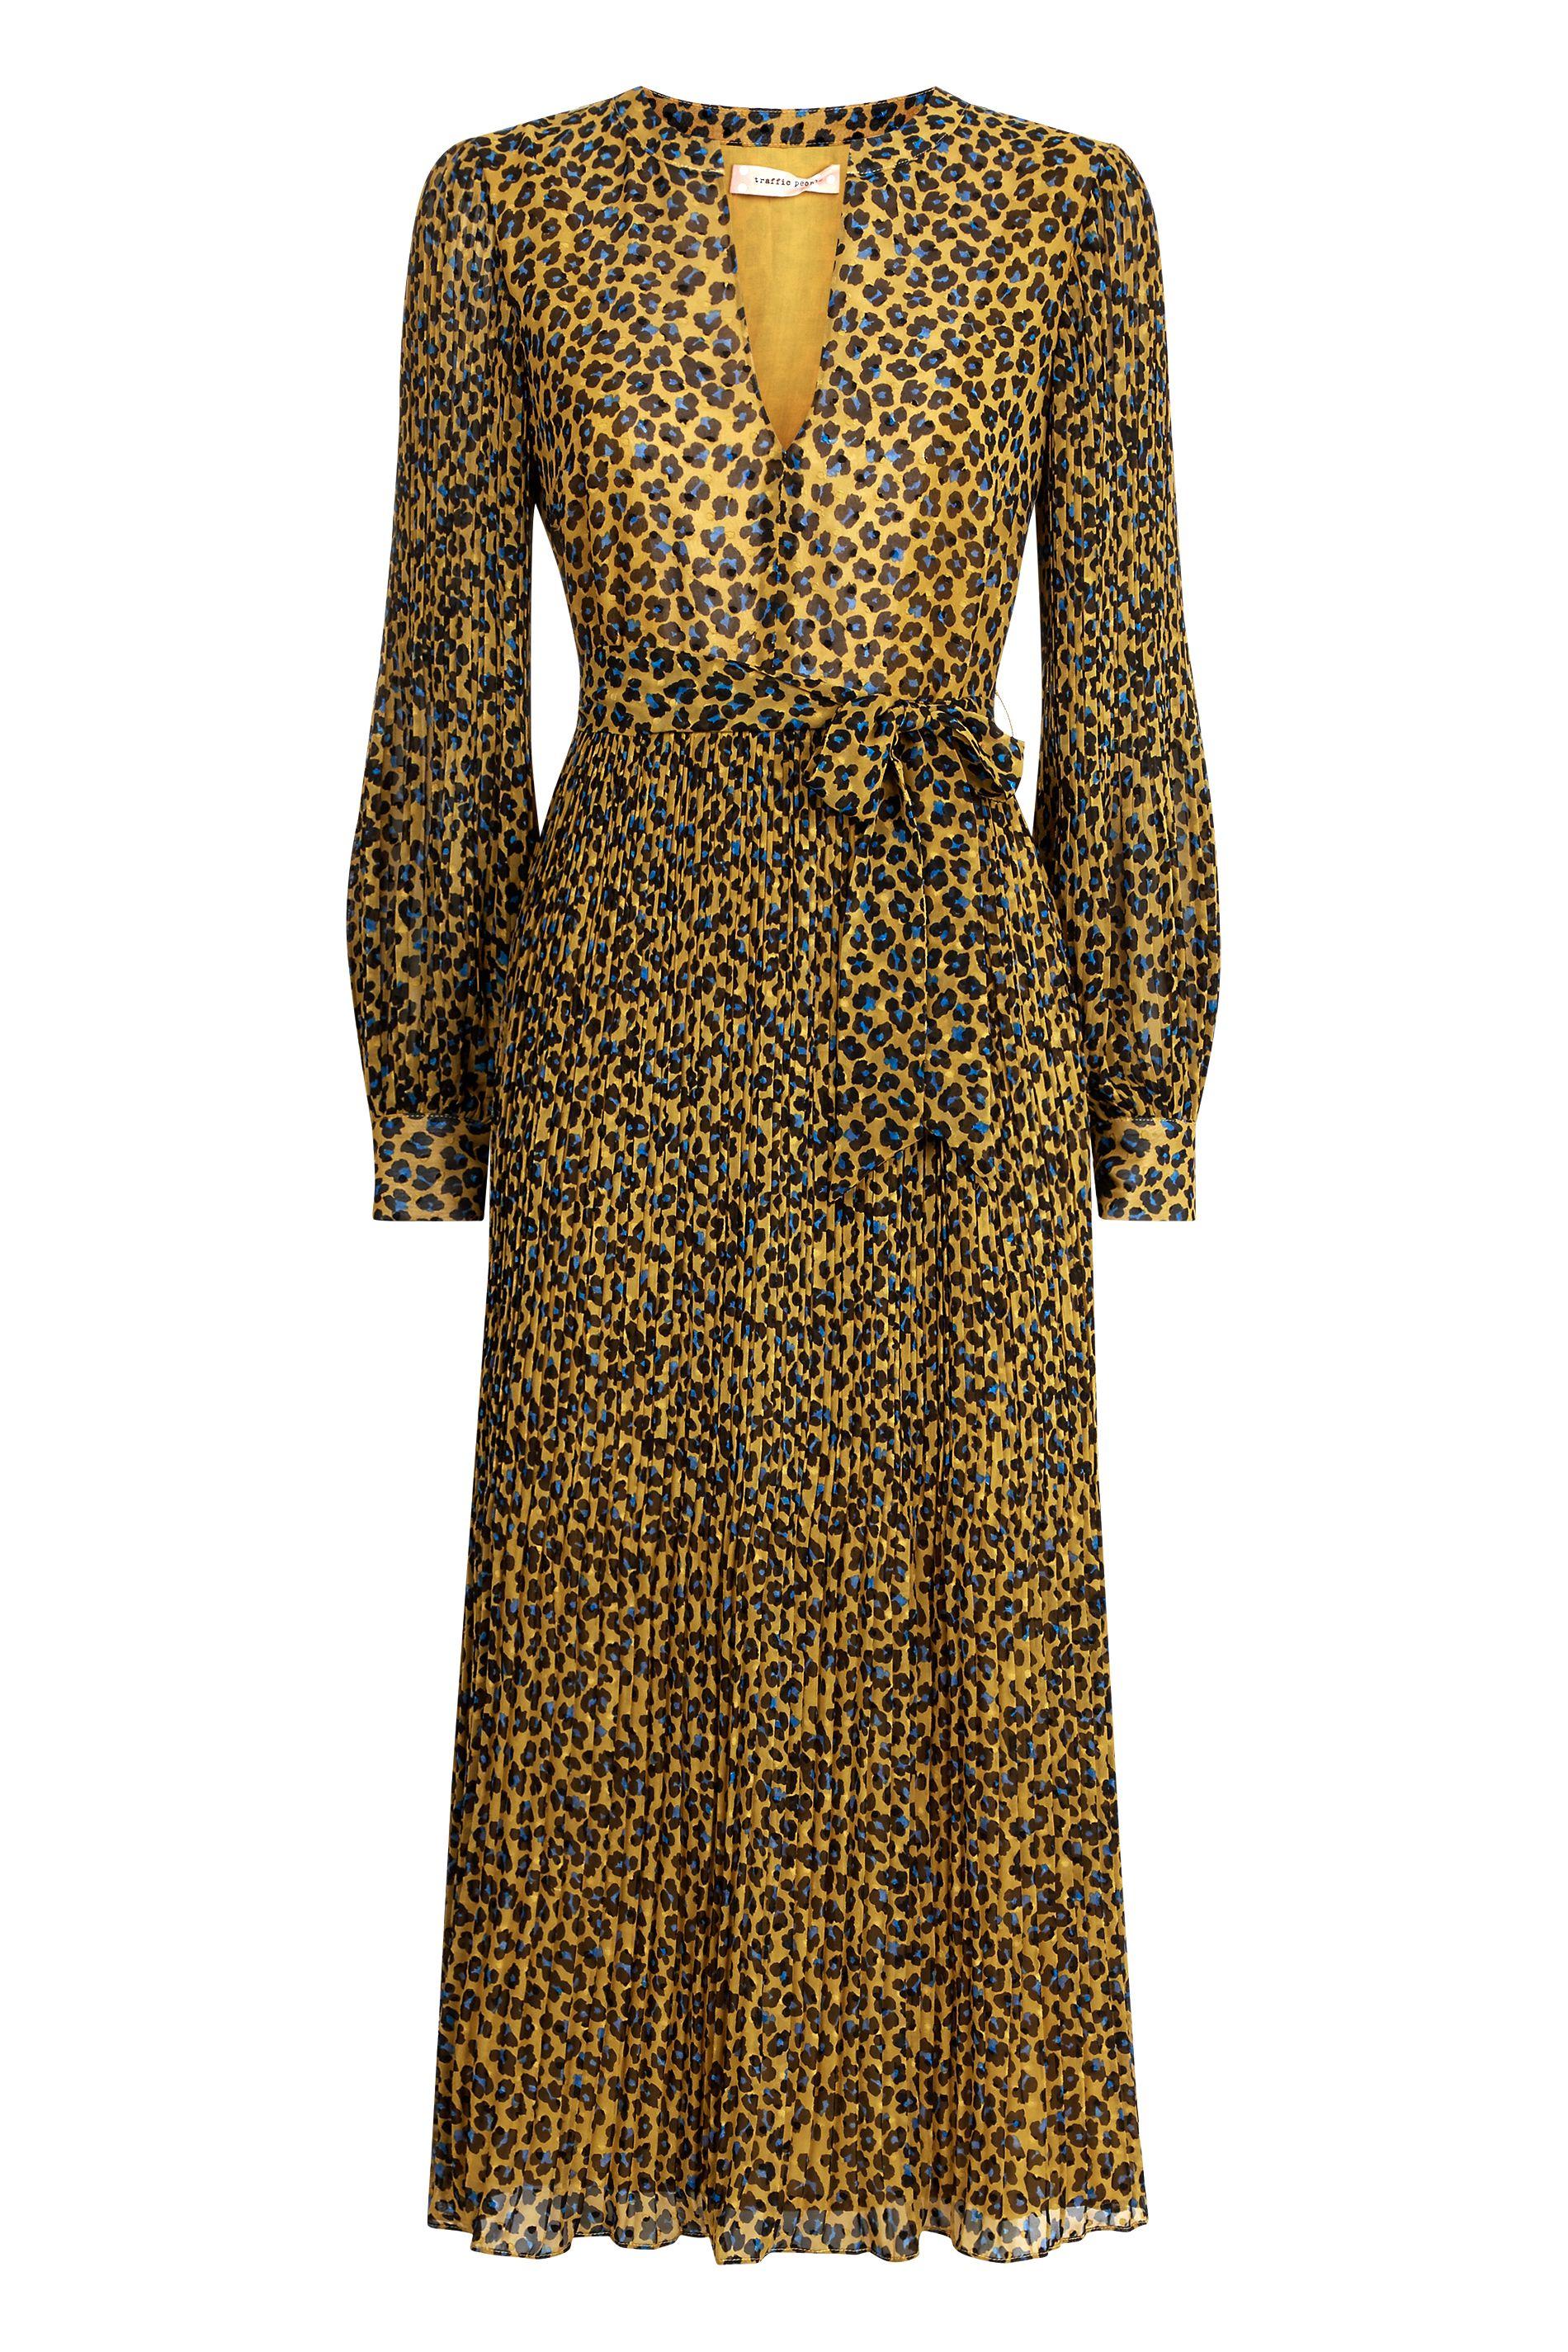 Fallen Animal Print Maxi Dress in Mustard